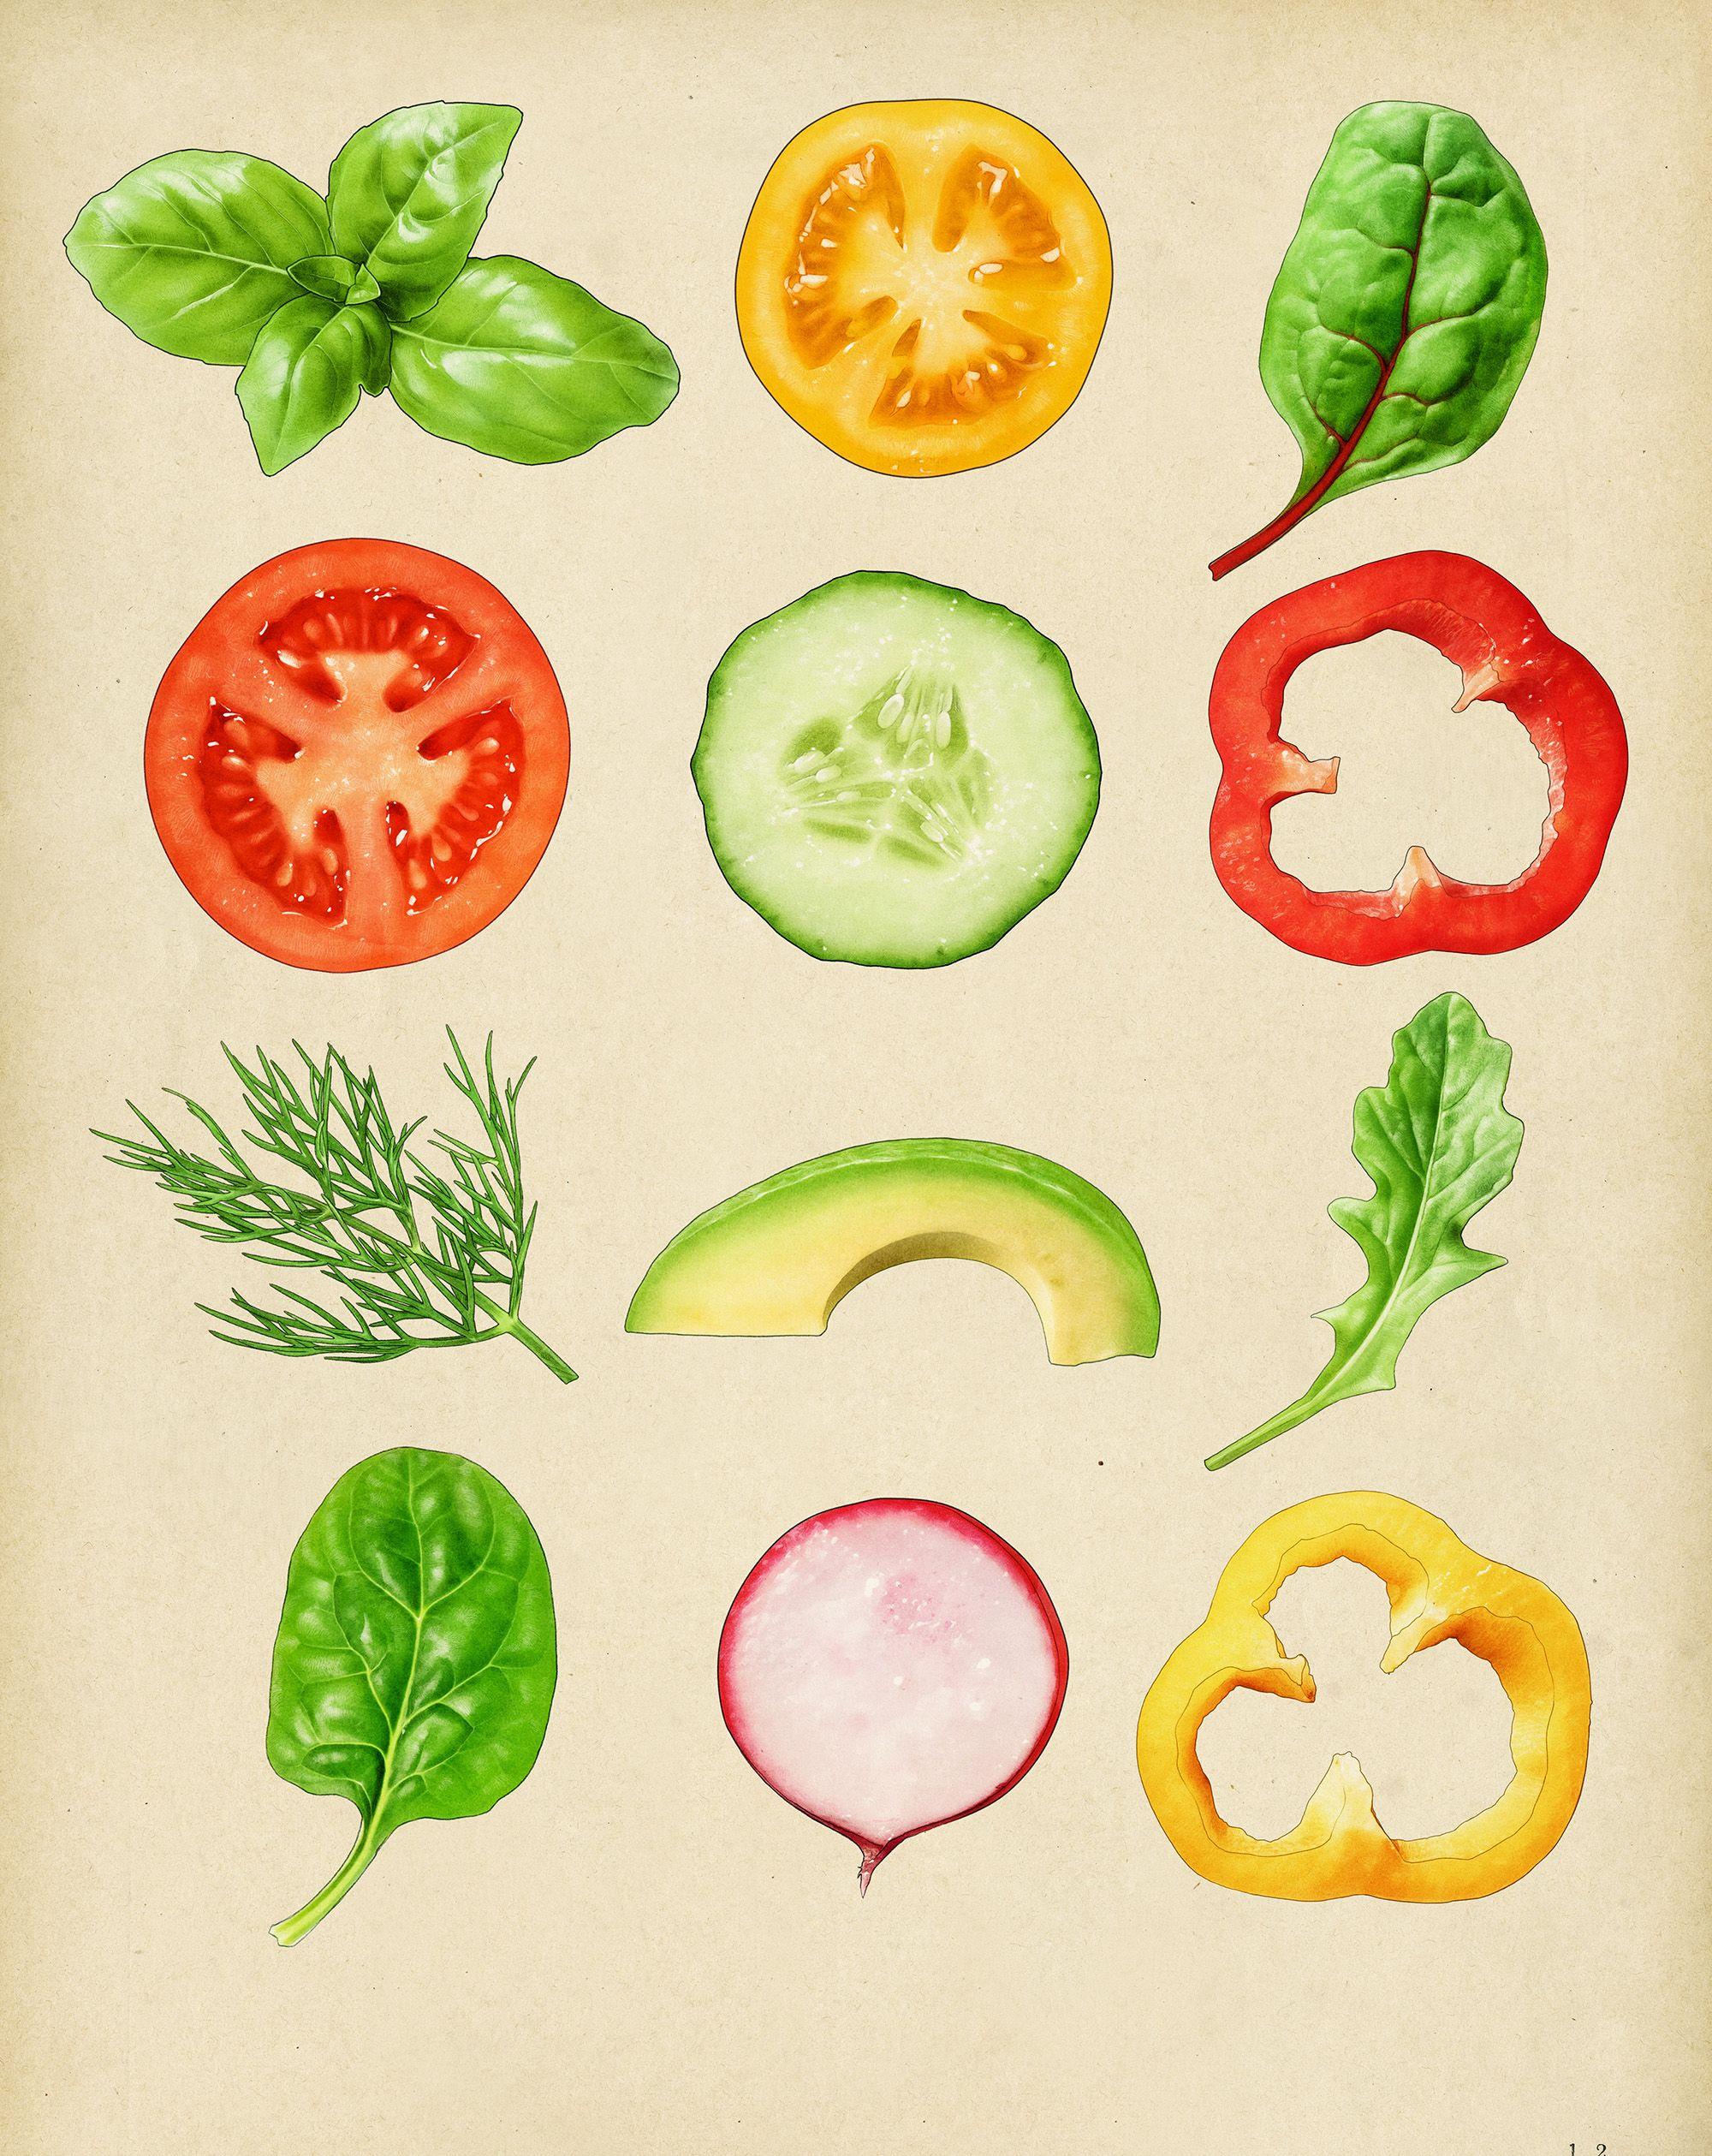 vegetable illustrations for sandwich packaging Parsons.